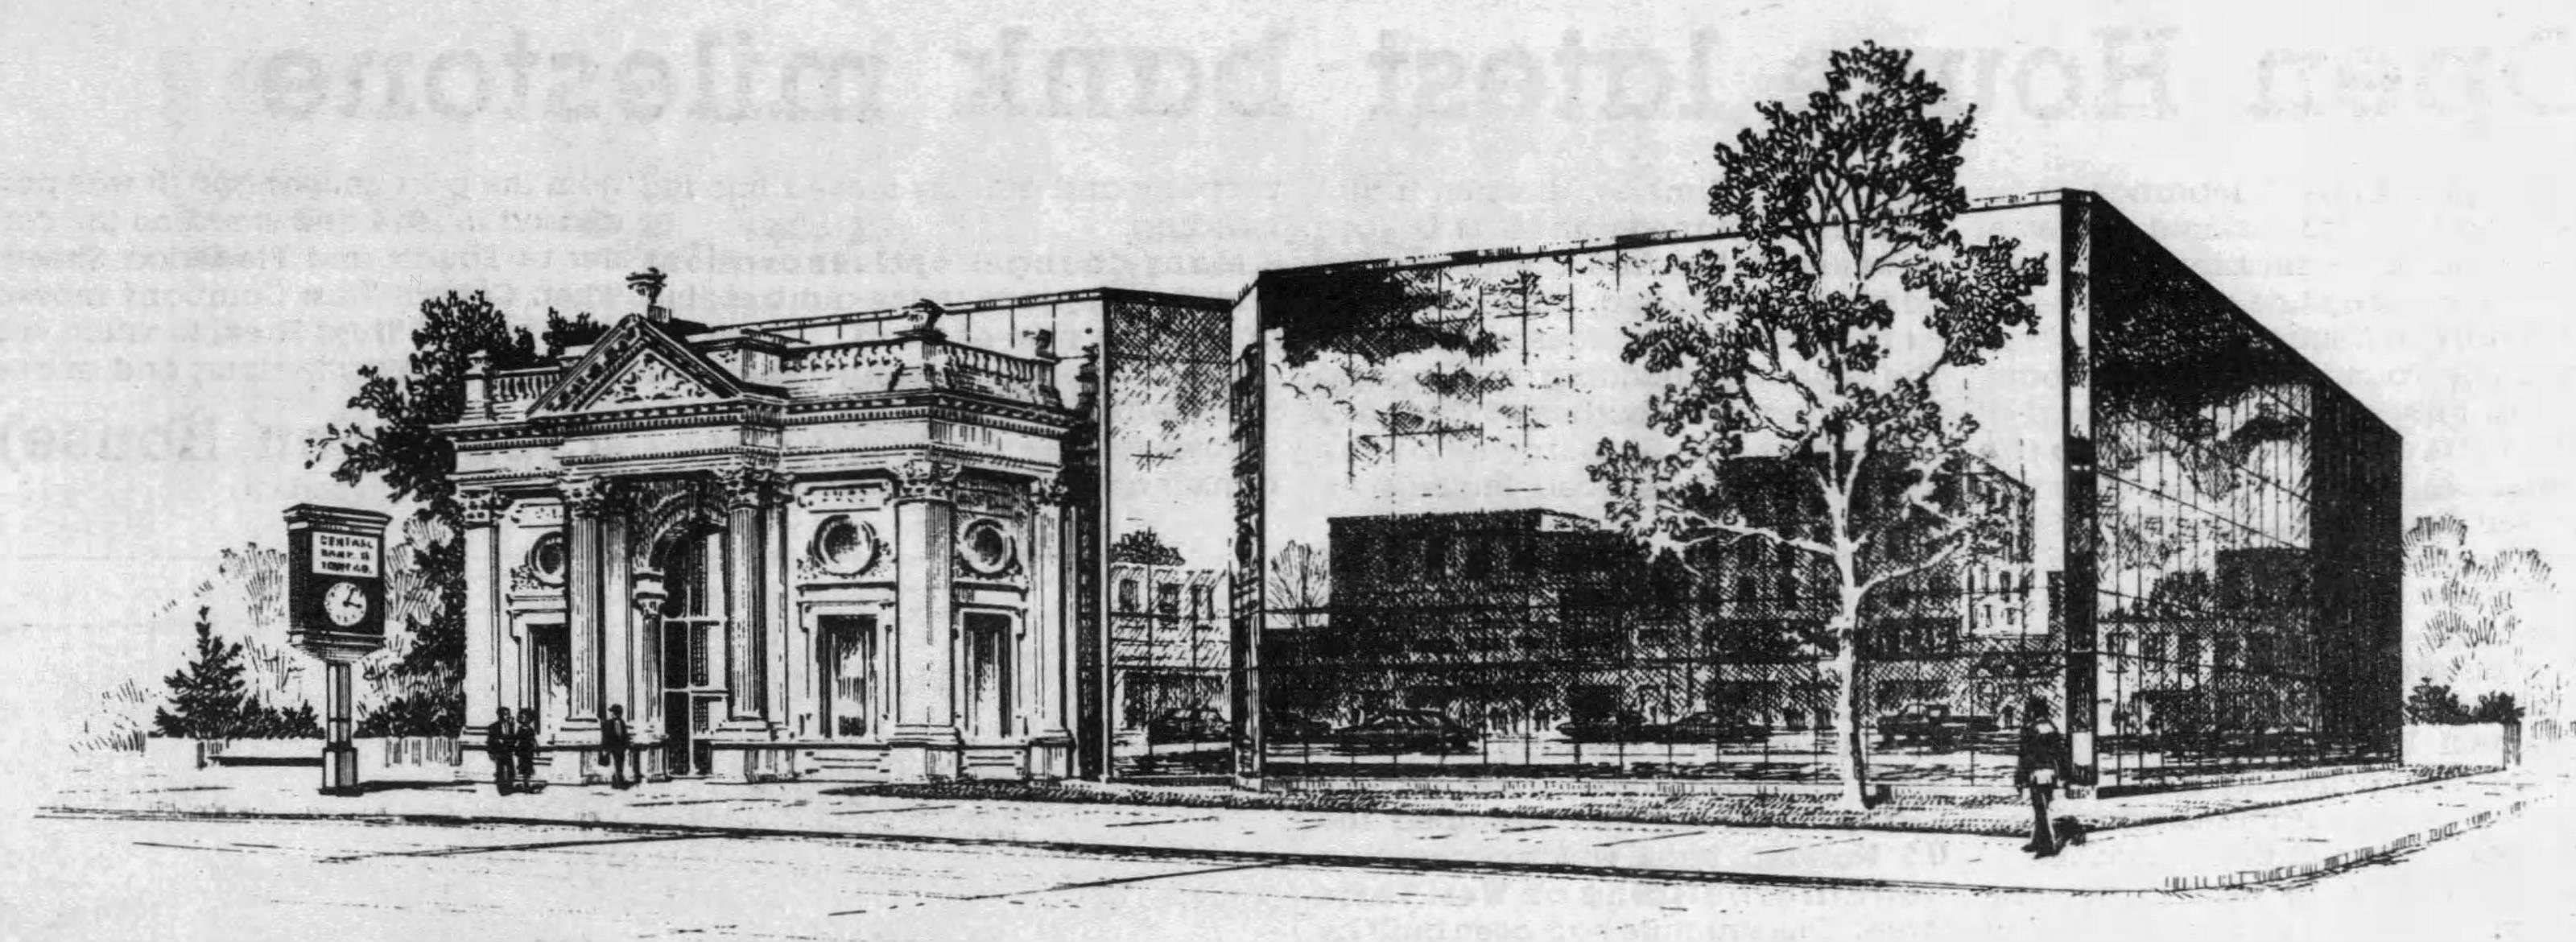 Artist's illustration of building in 1984